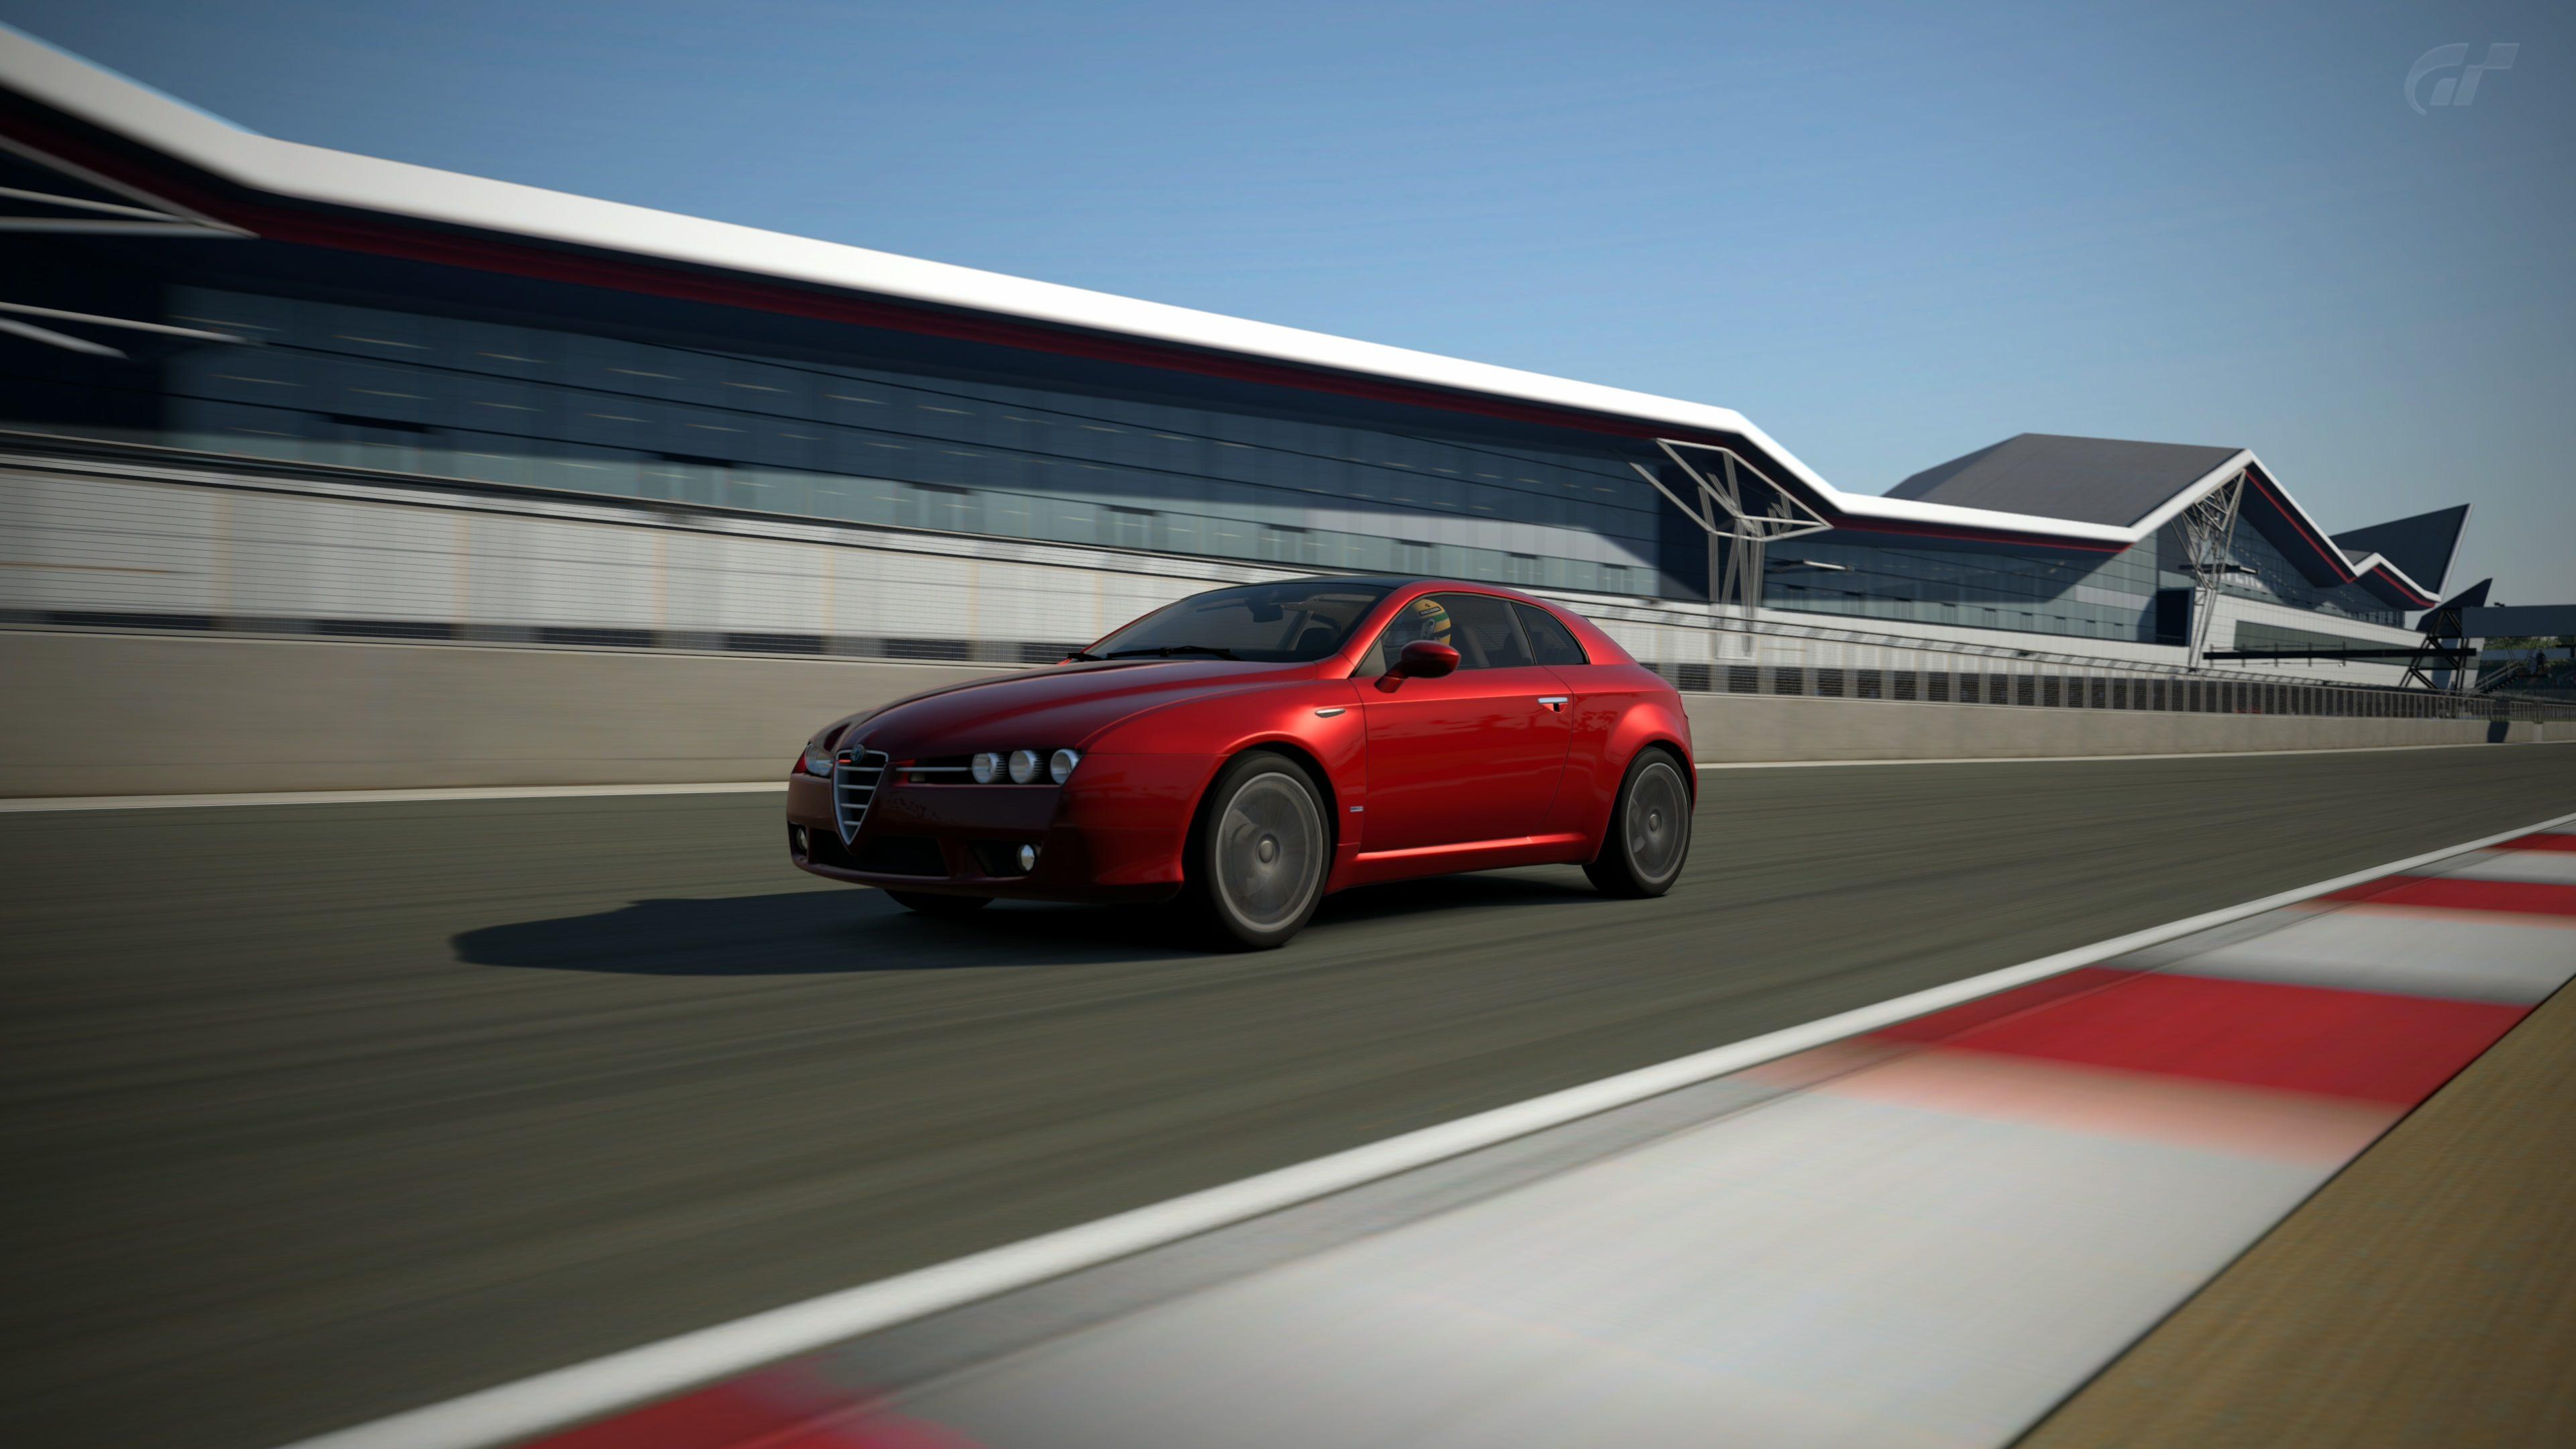 Alfa Romeo Brera S by Prodrive (1).jpg